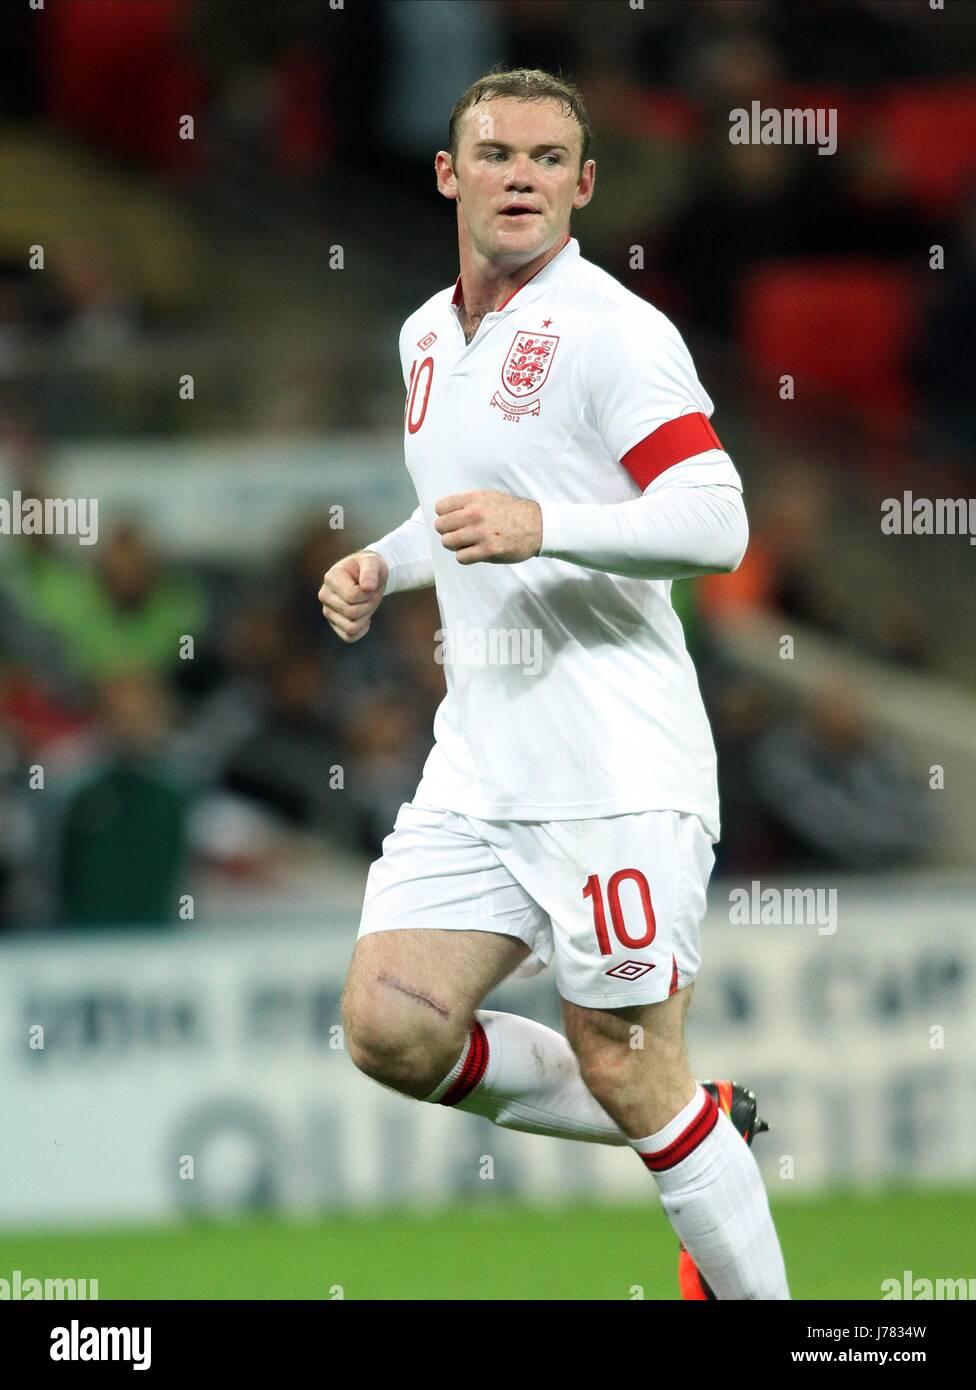 WAYNE ROONEY, ENGLAND, ENGLAND V SAN MARINO. WORLD CUP 2014 QUALIFIER, 2012 - Stock Image